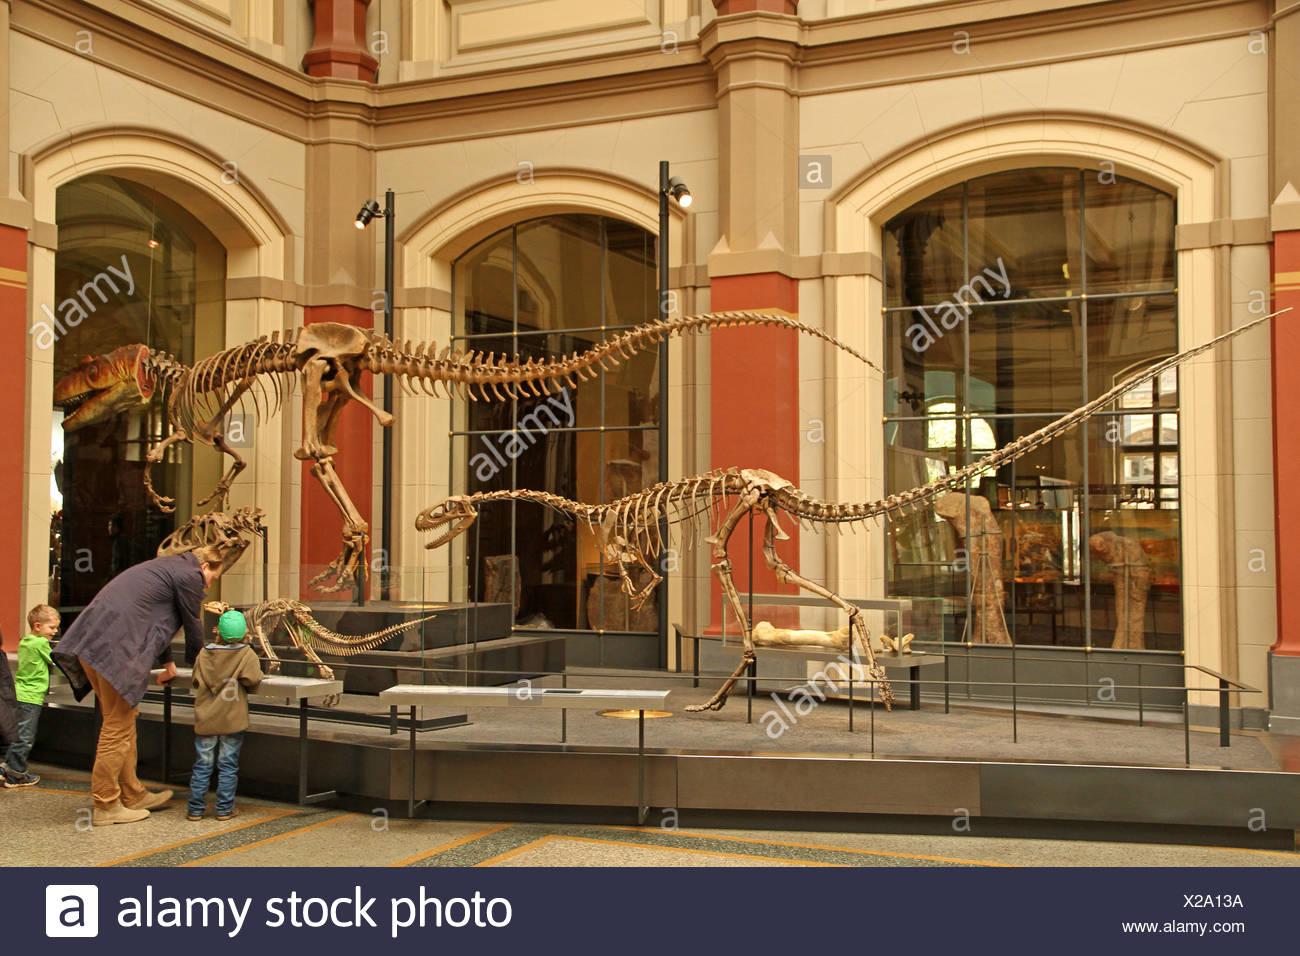 Dinosaur skeletons - Stock Image